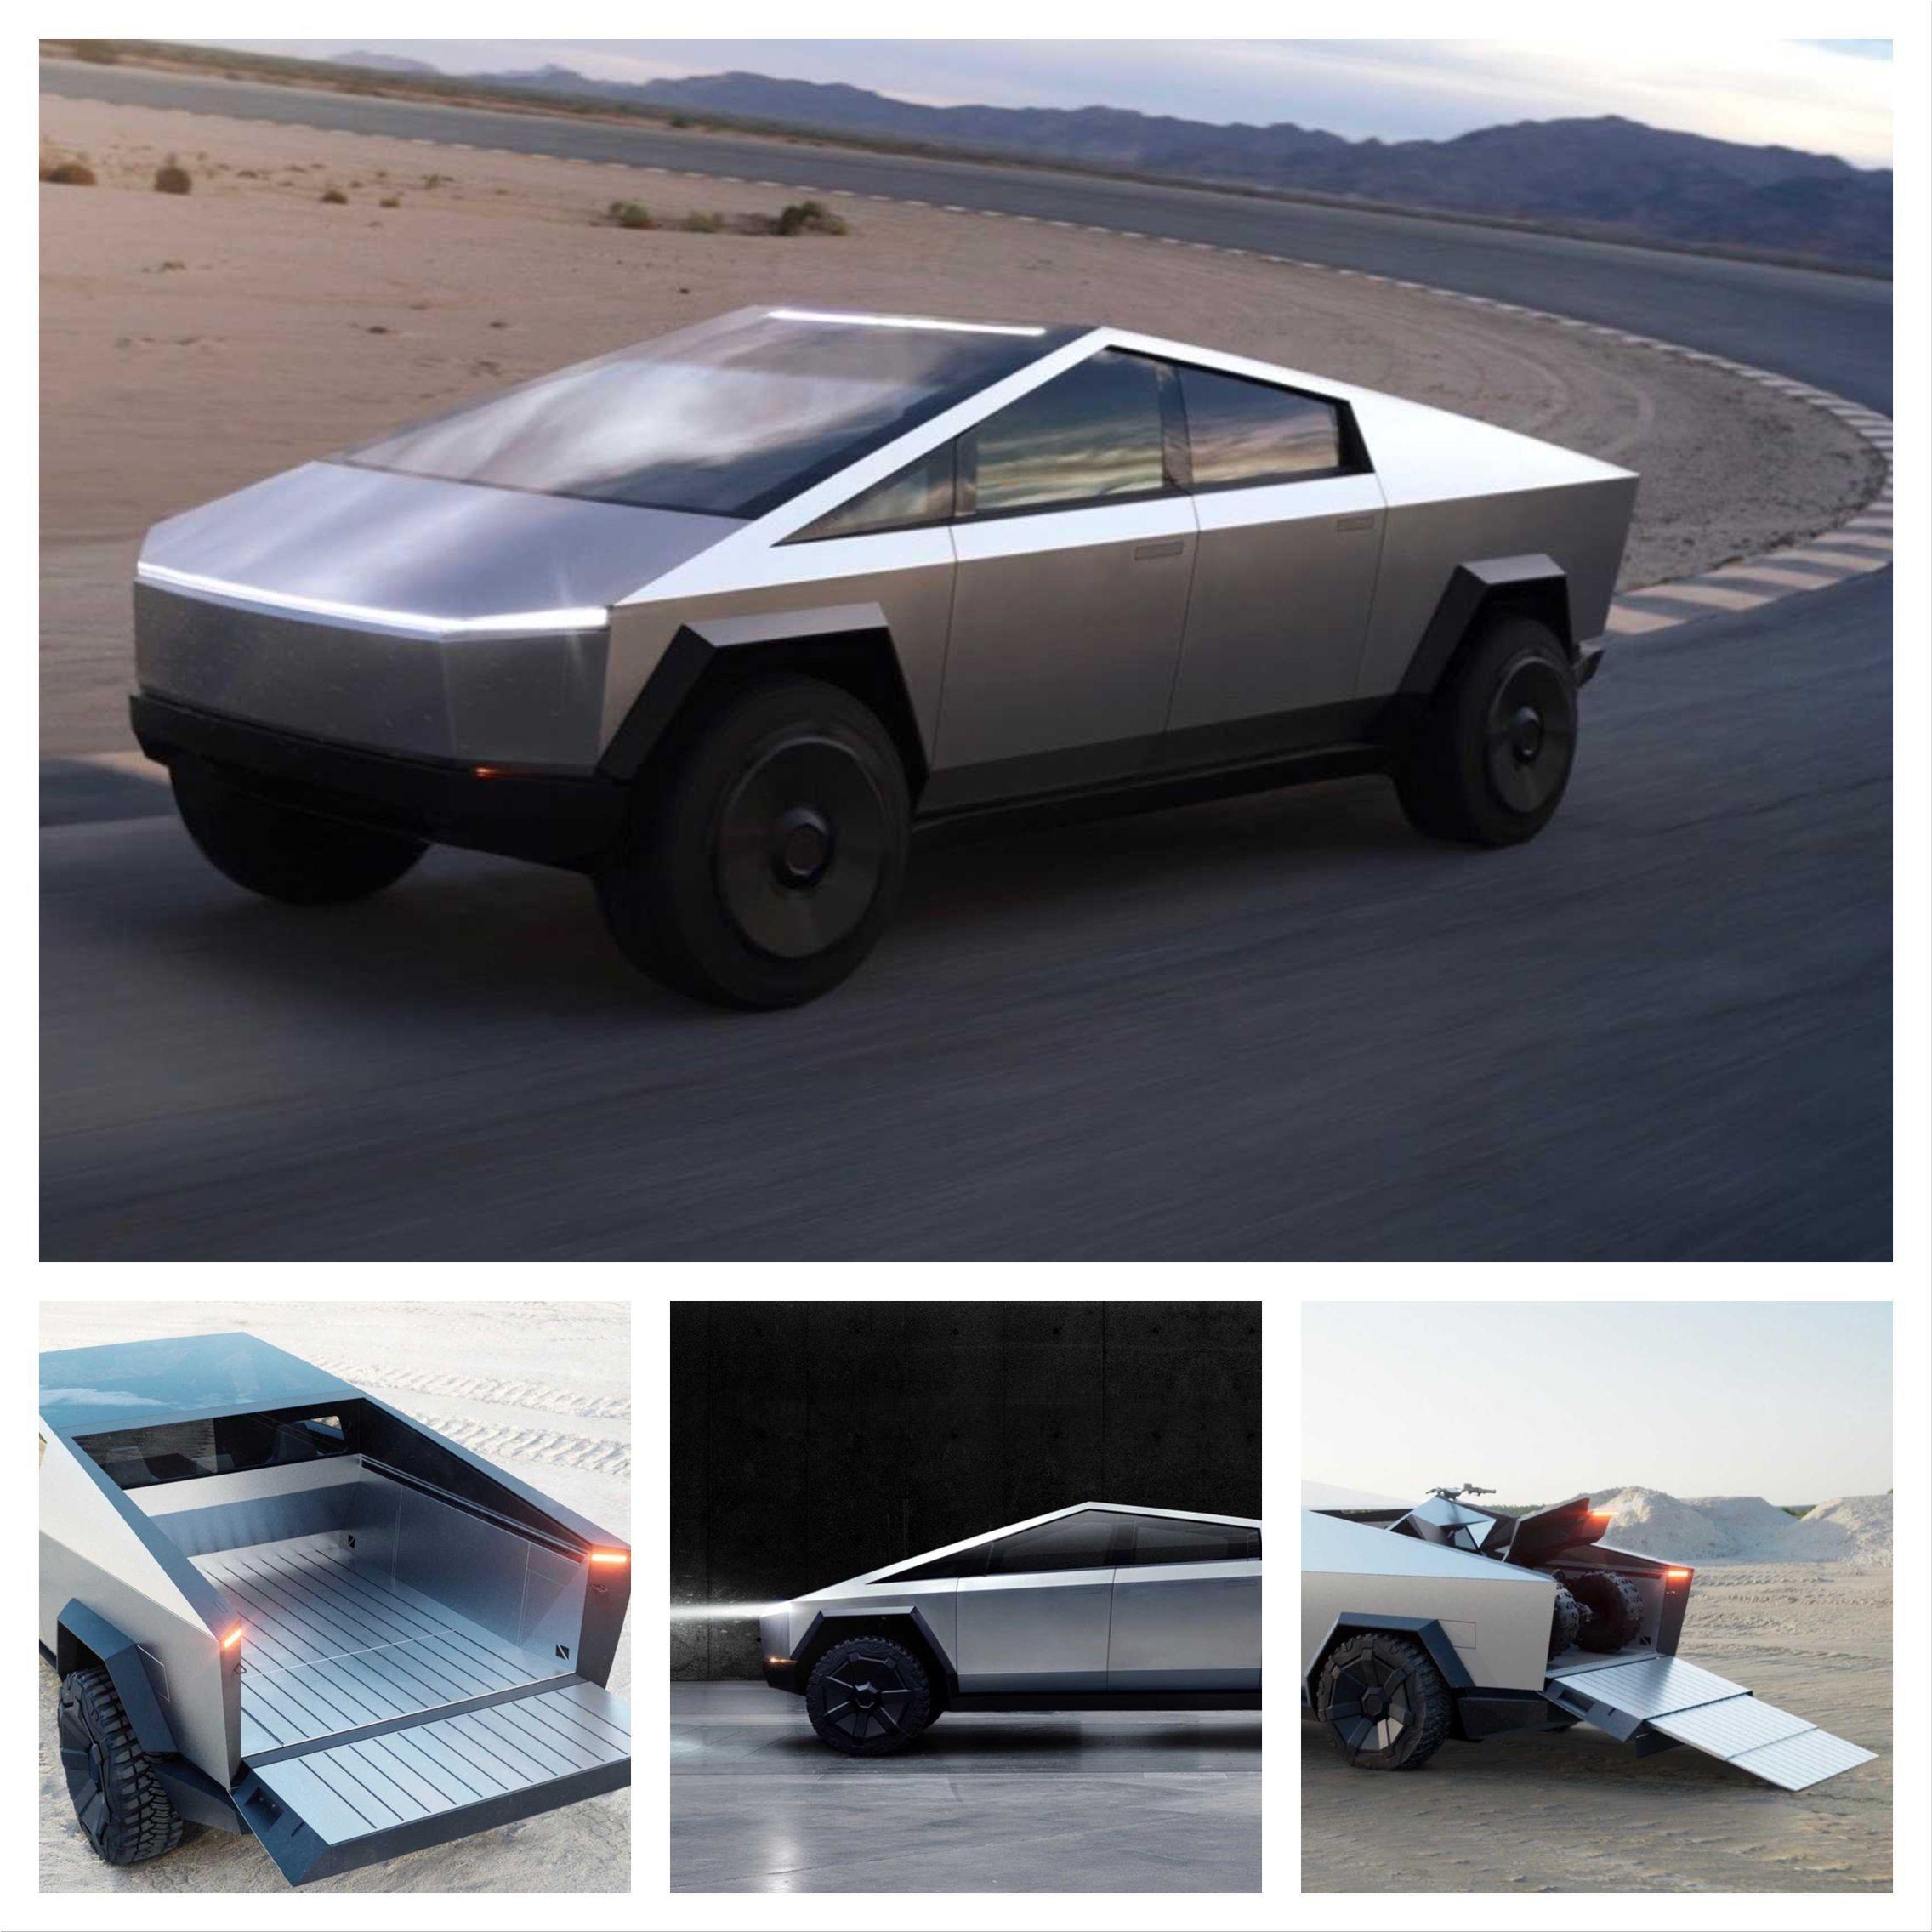 Tesla Cybertruck Electric Pick Up With Autonomy Of Up To 800 Kilometers And All Wheel Drive Tesla Tesla Electric Car Tesla New Tesla